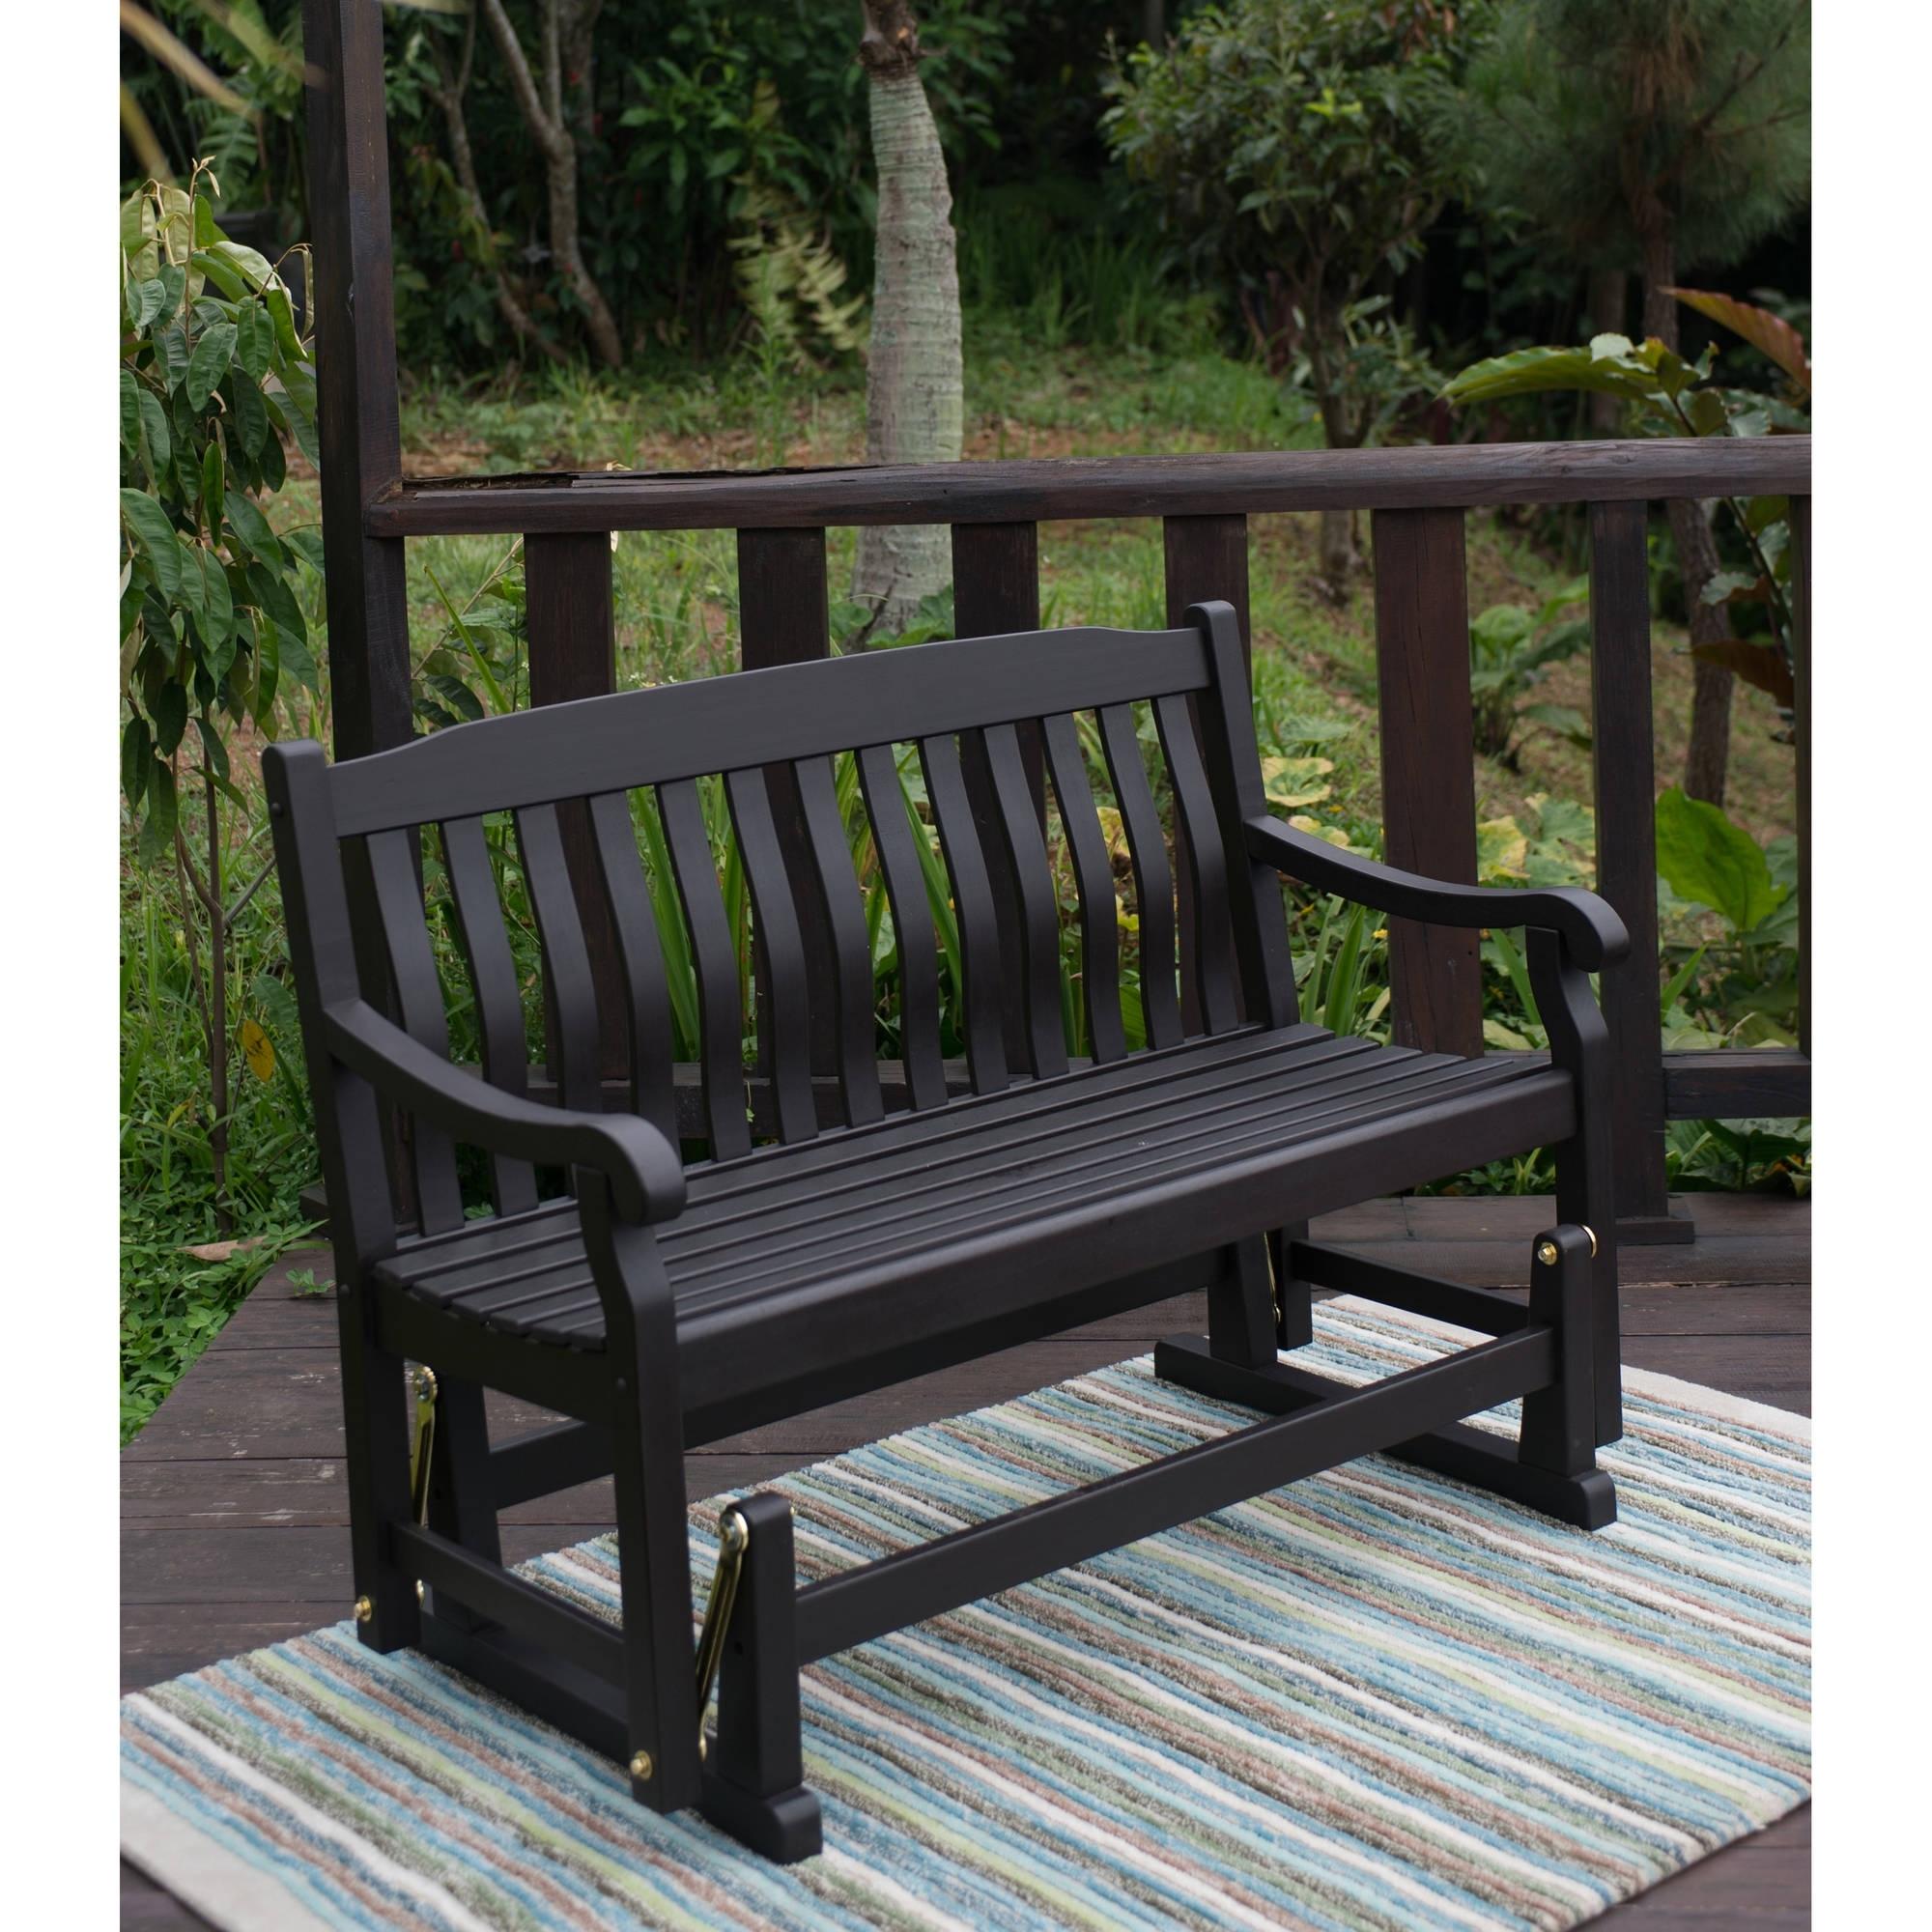 Better Homes & Gardens Delahey Outdoor Glider Bench, Dark Brown Inside Patio Furniture Rocking Benches (View 1 of 15)